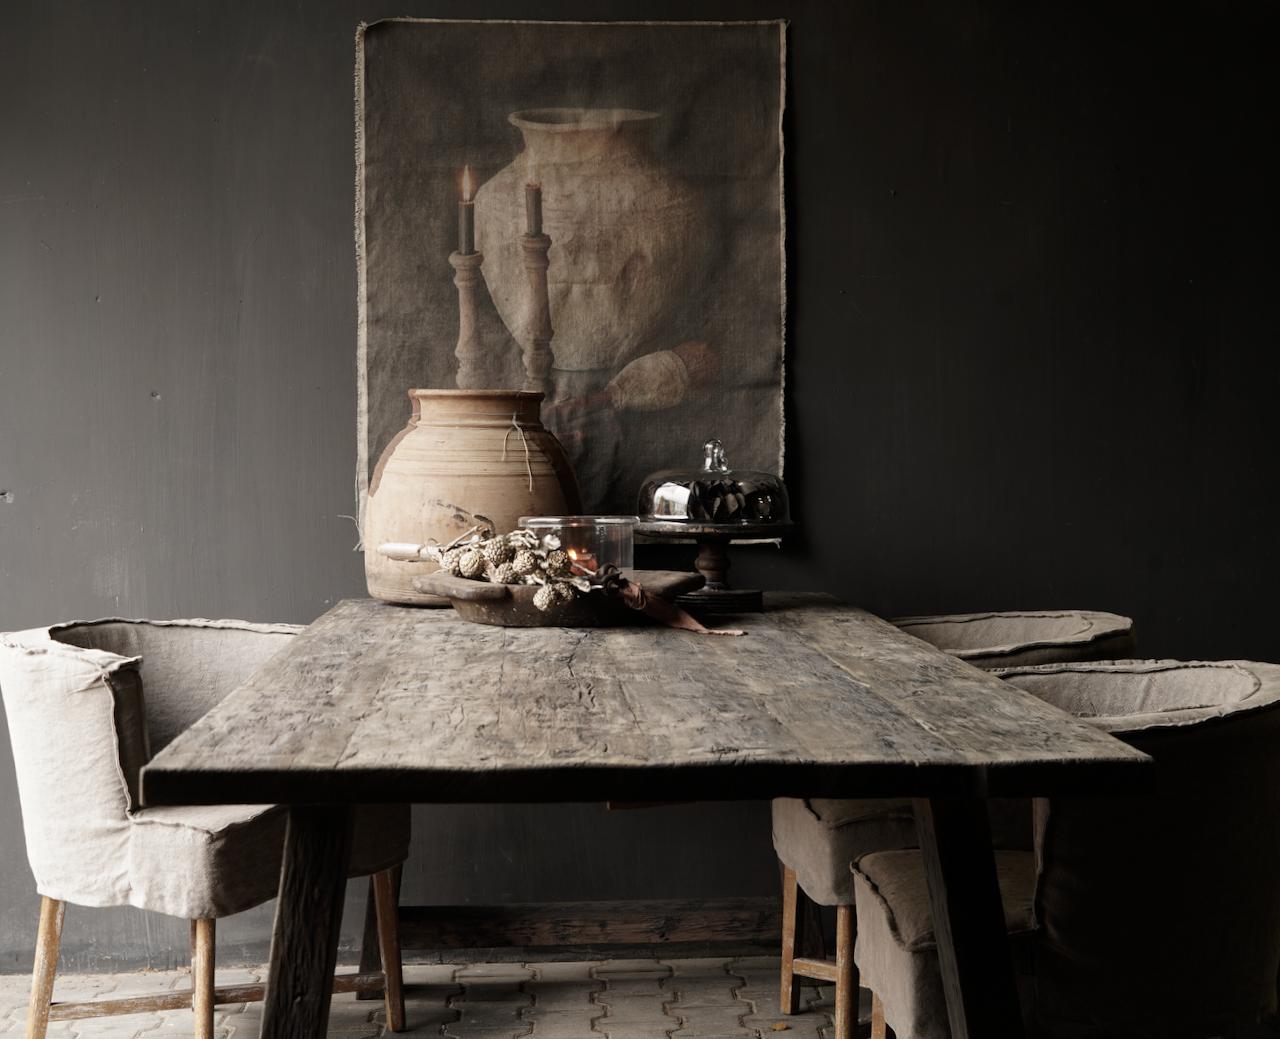 Stoer donker oud houten eetkamer tafel  met A poot-2